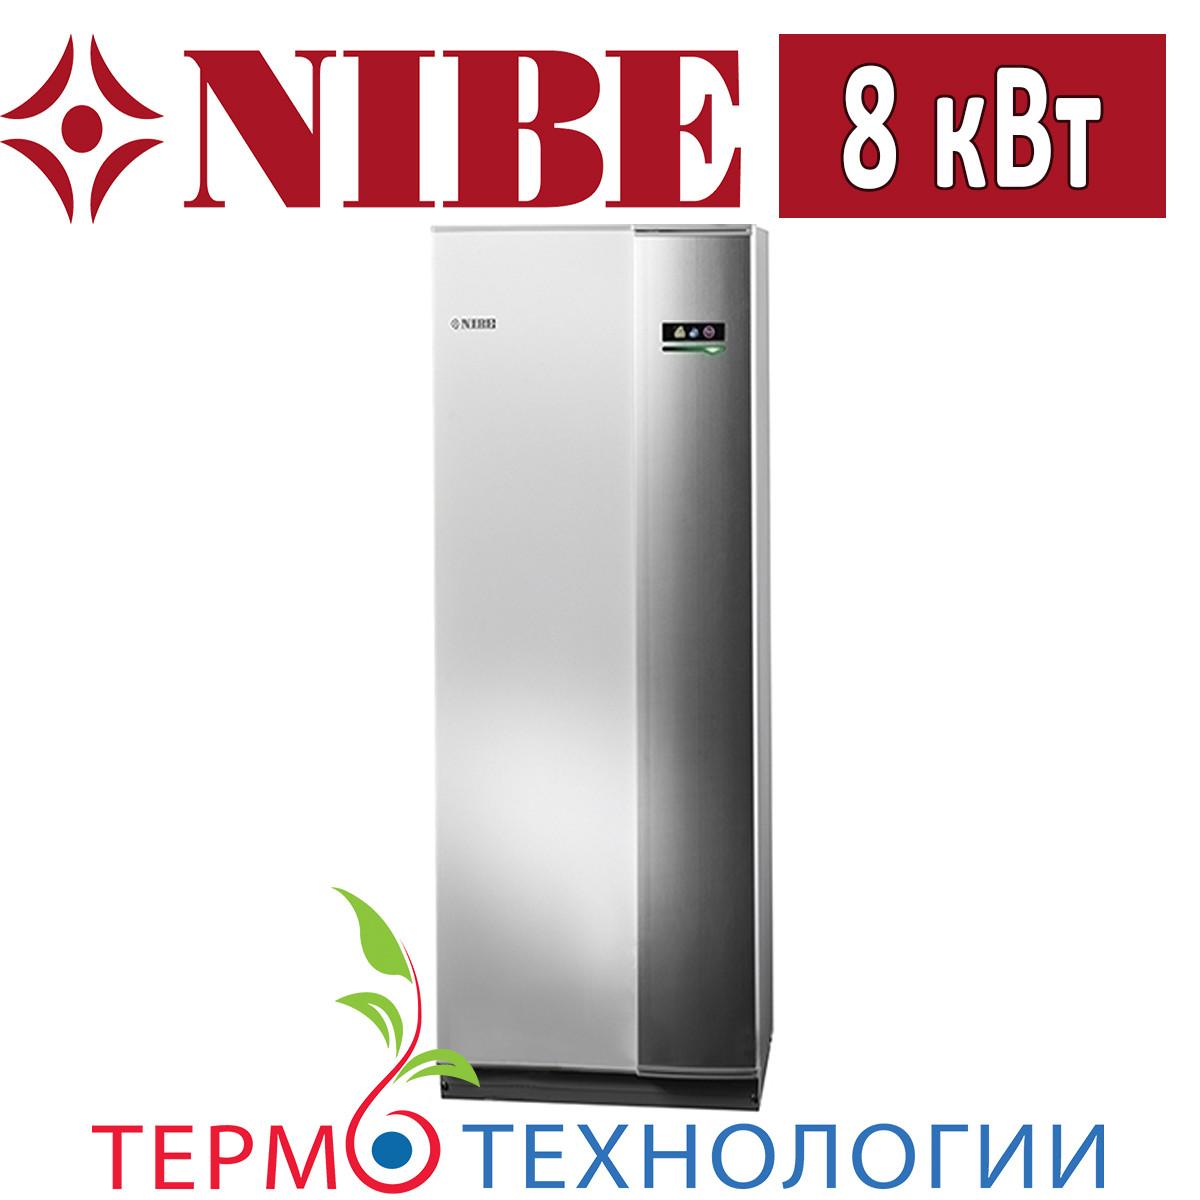 Тепловой насос грунт-вода Nibe F1245-8 R 8 кВт, 380 В